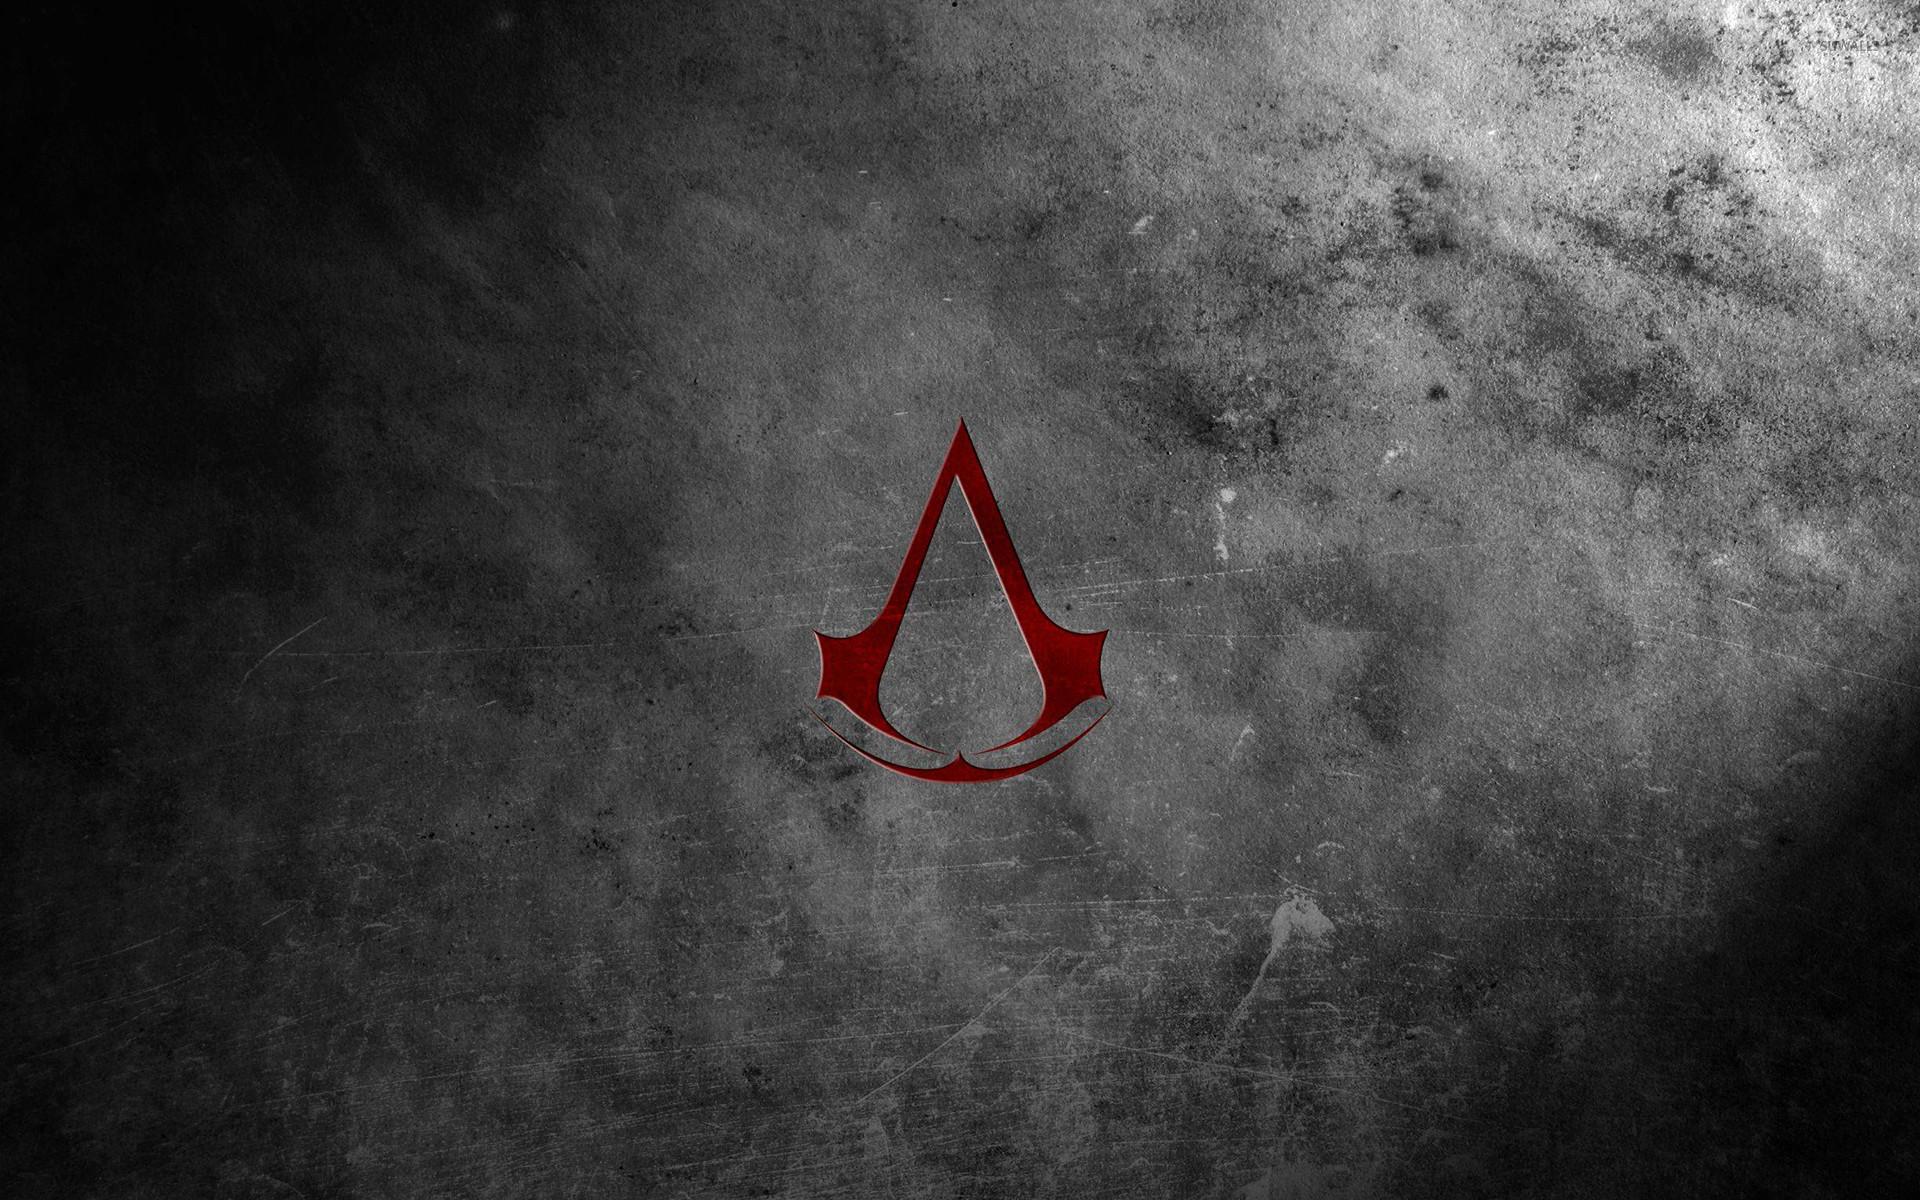 Red Assassin's Creed logo wallpaper